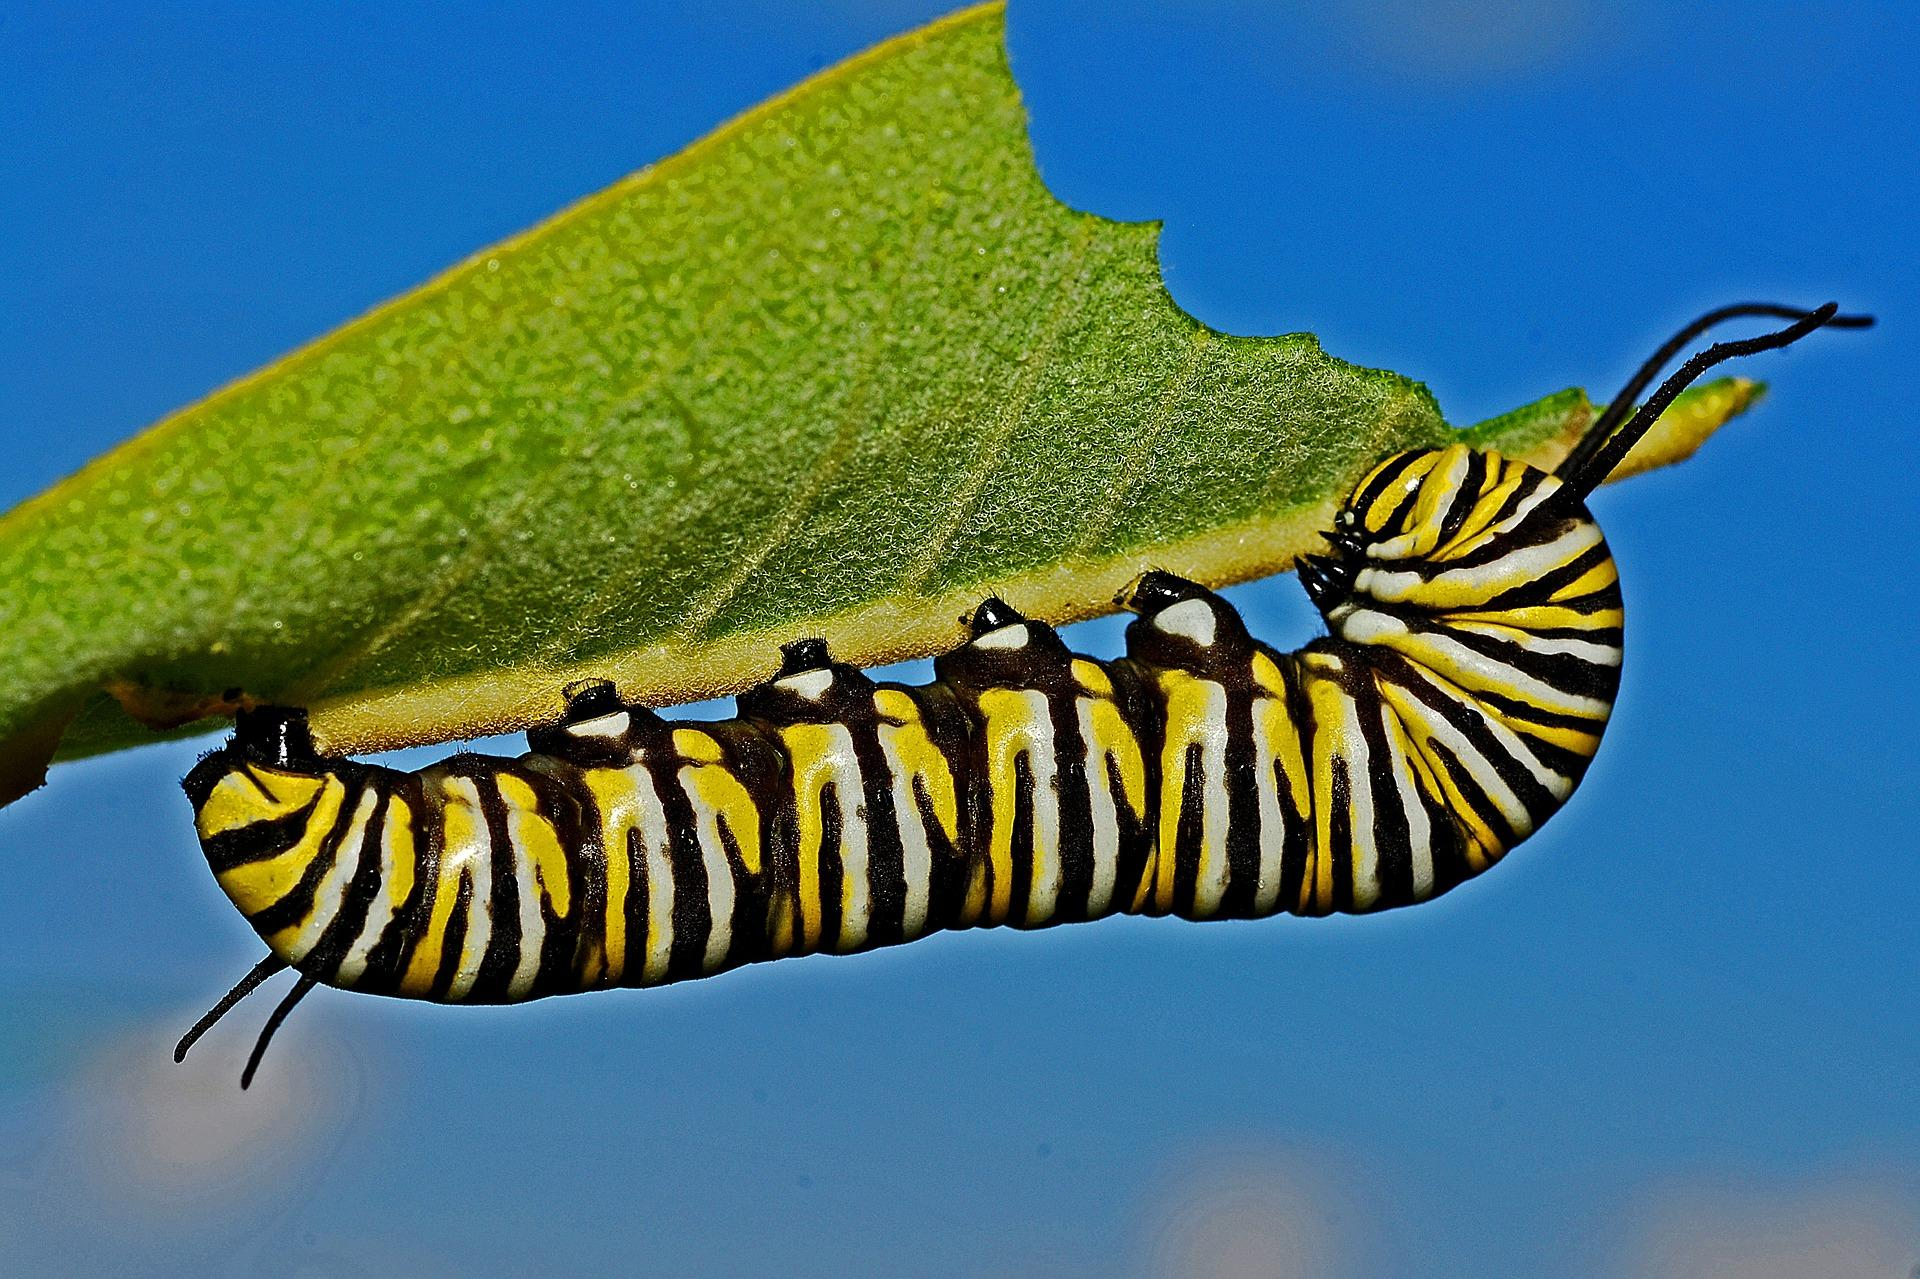 caterpillar-562104_1920-1493224341950.jpg